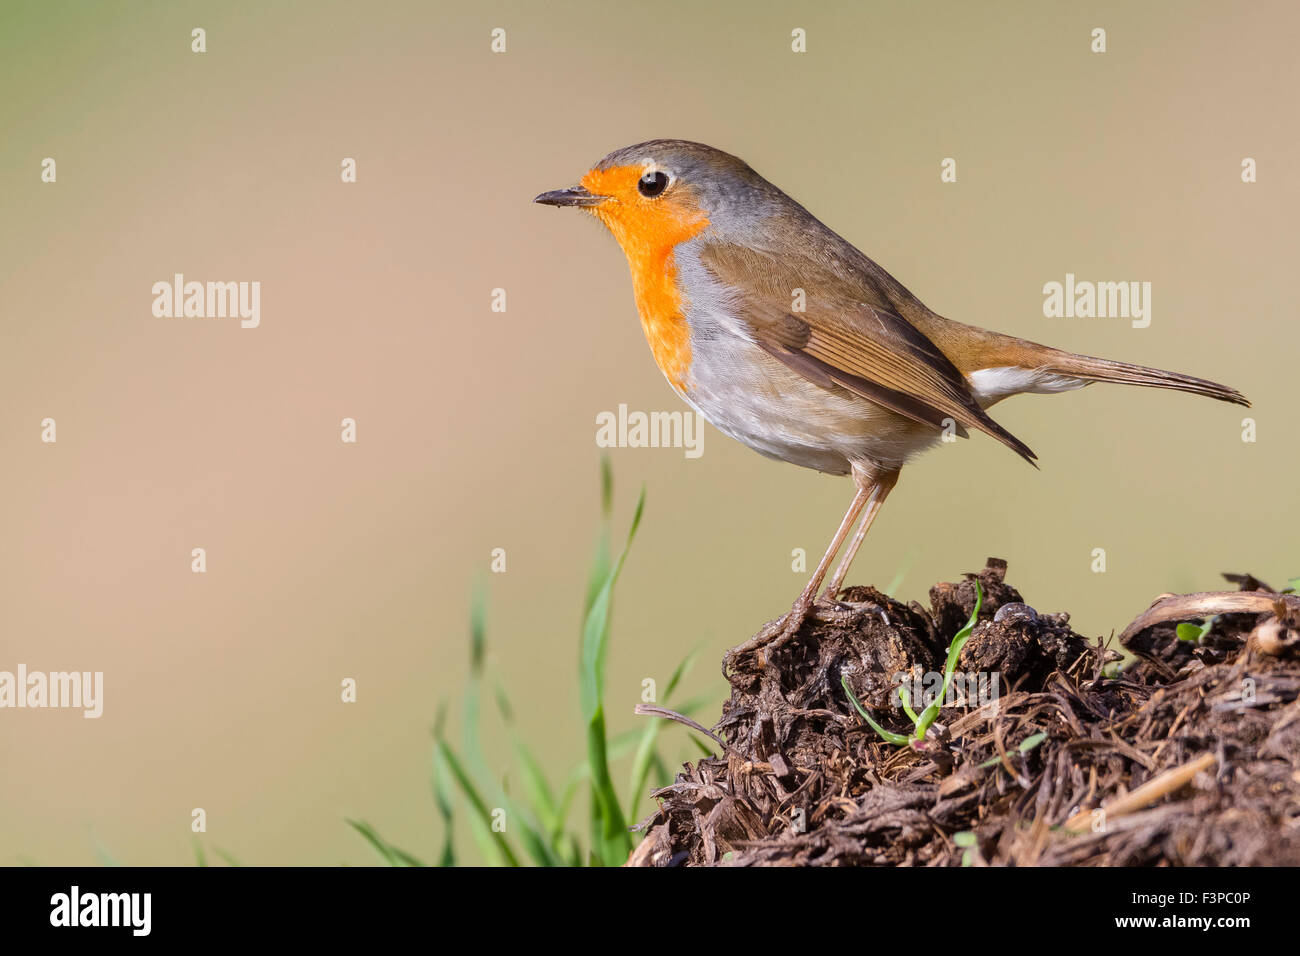 European Robin, adult perched, Campania, Italy (Erithacus rubecula) - Stock Image